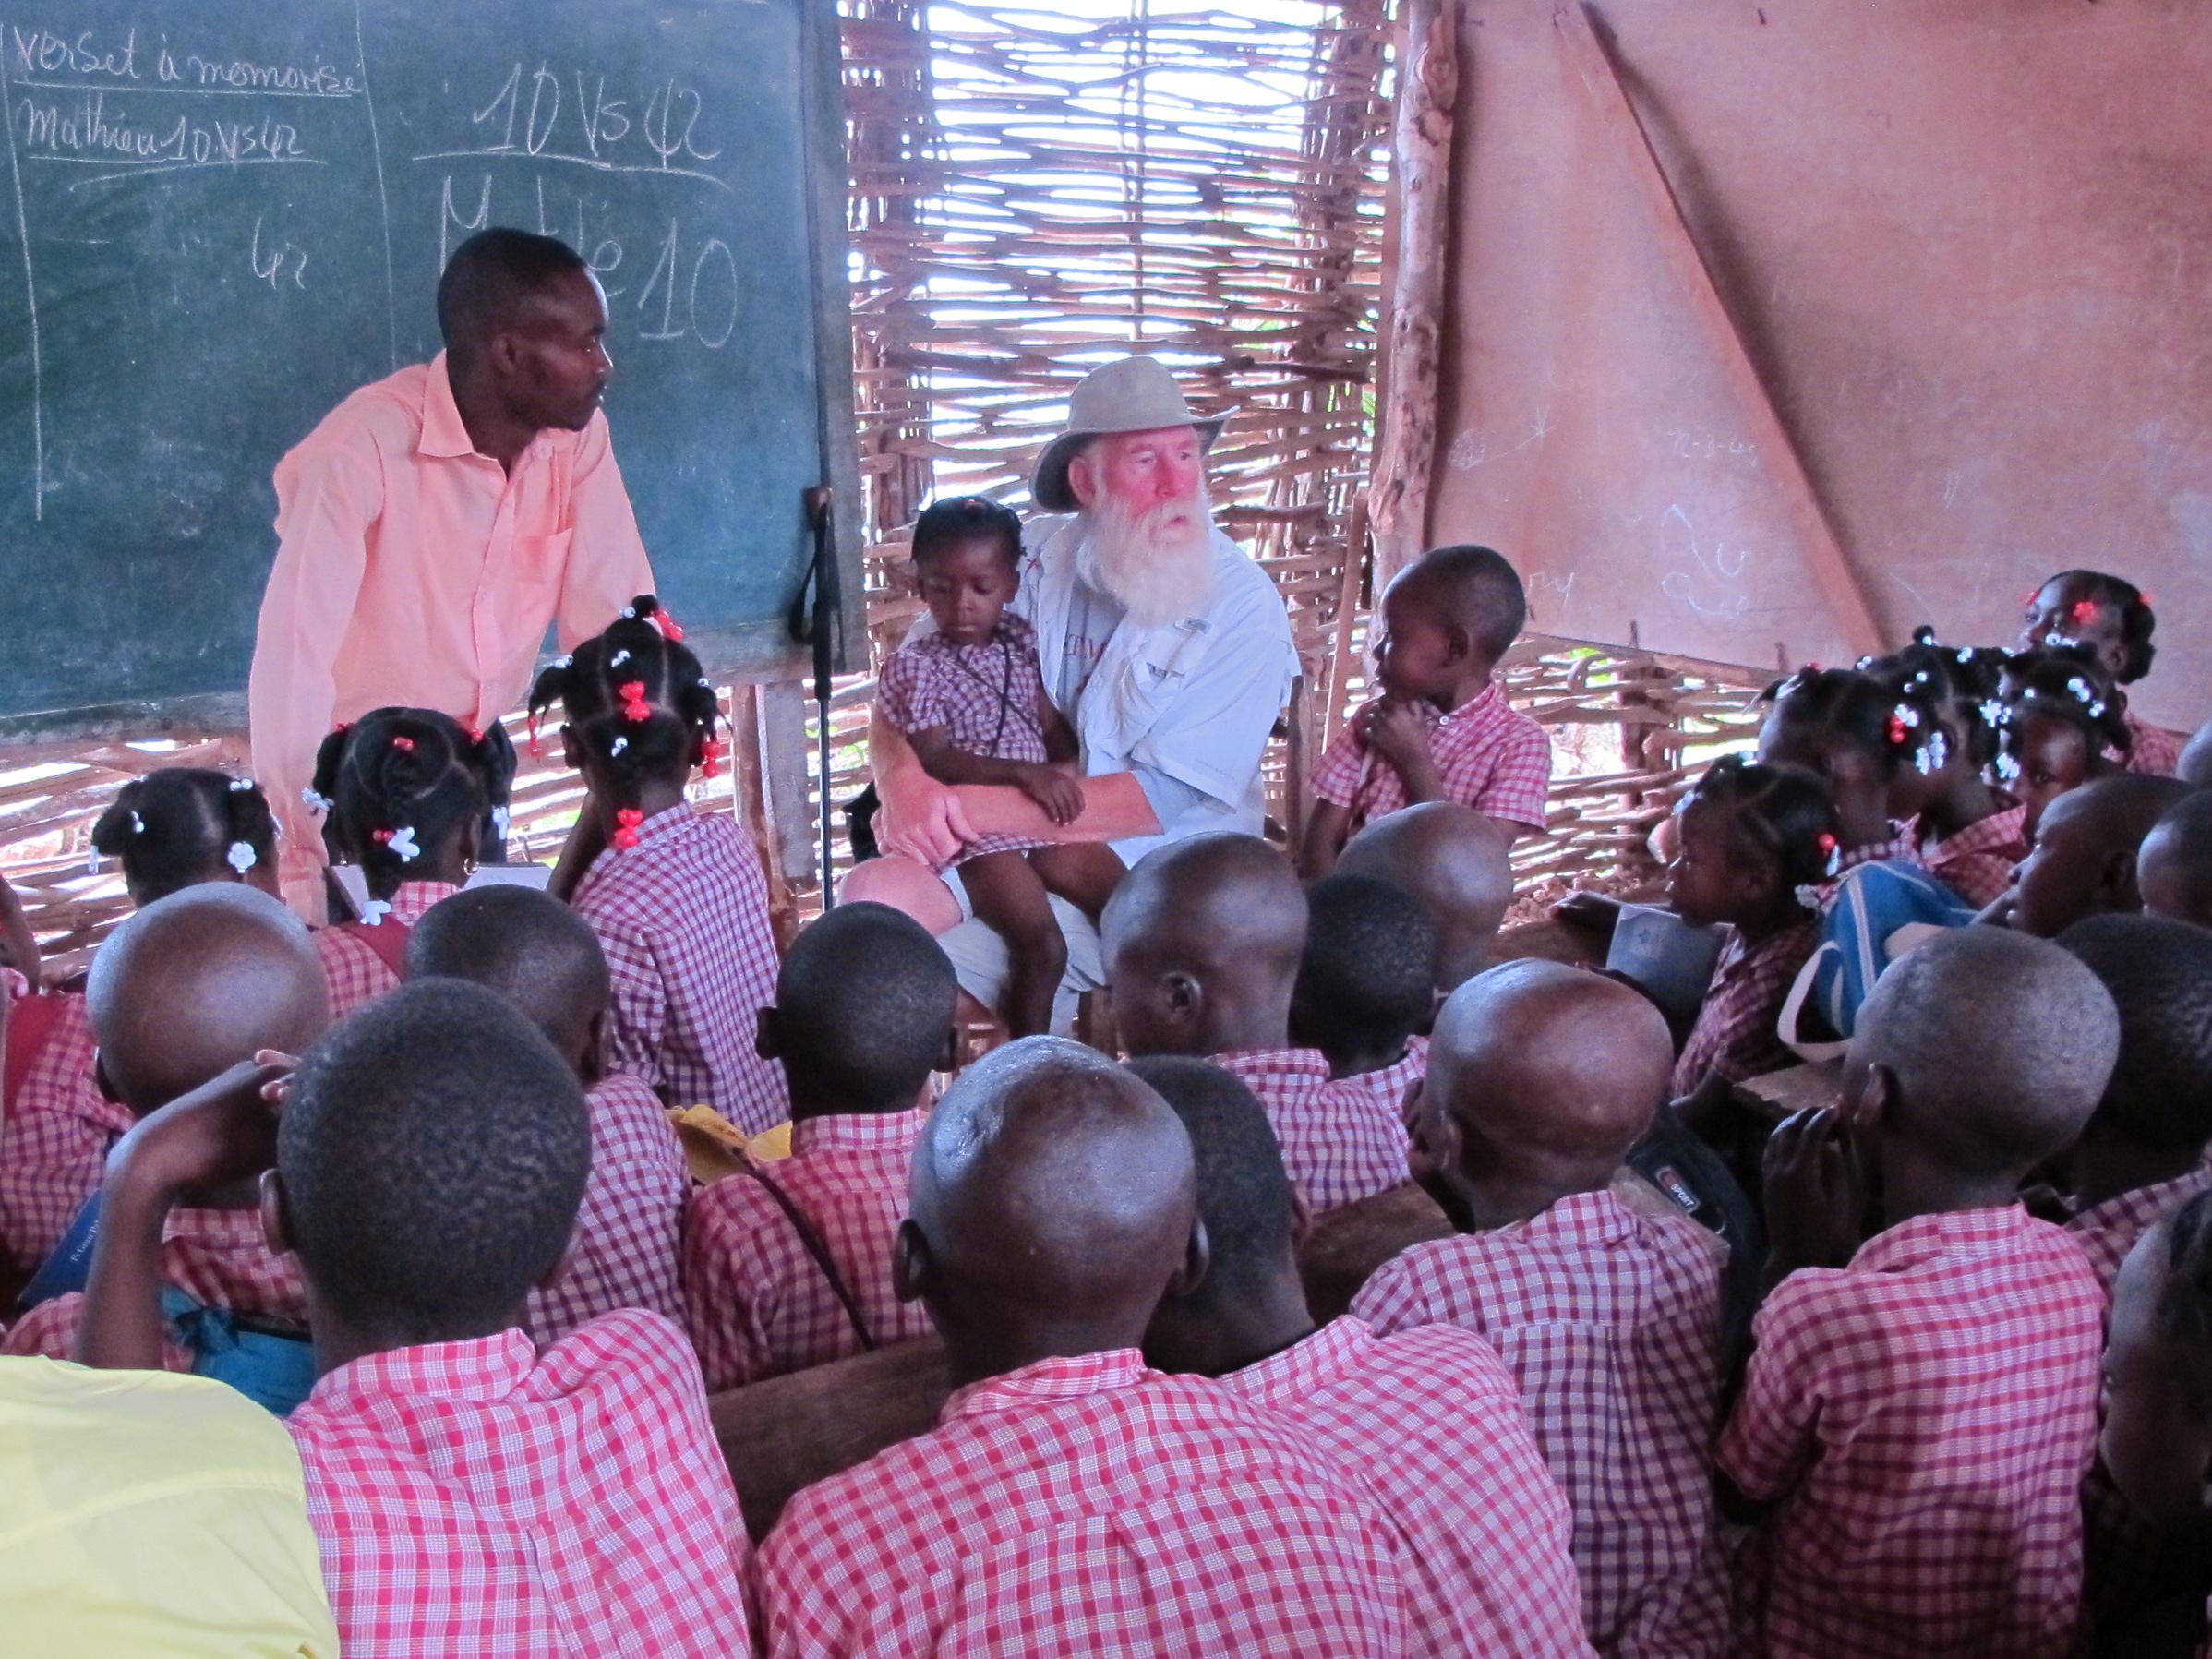 Bill talking to the Pelerin school children.